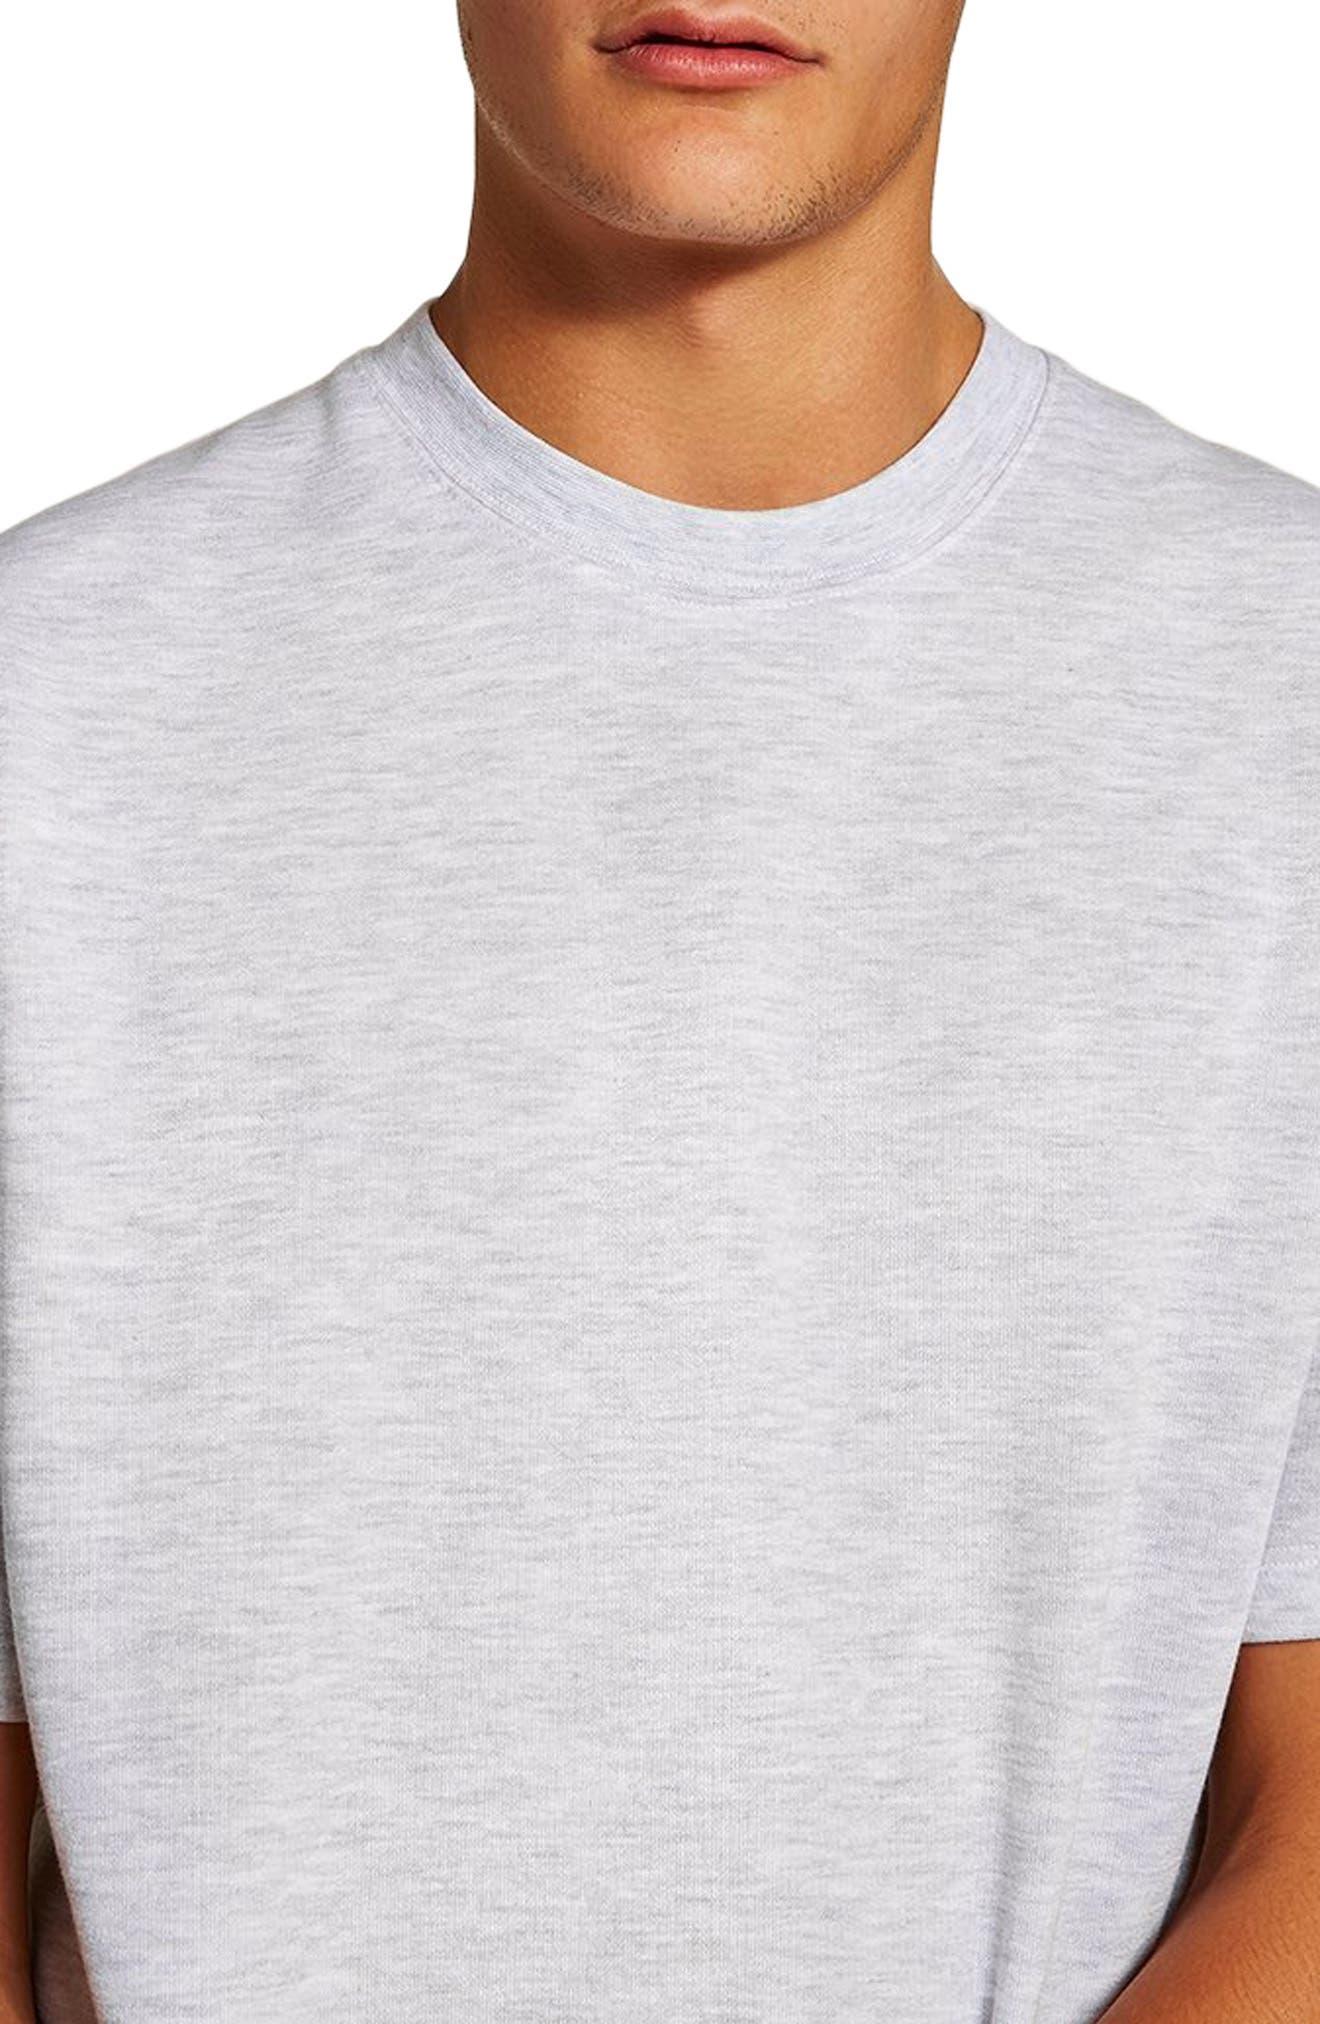 Short Sleeve Crewneck Sweatshirt,                             Alternate thumbnail 3, color,                             LIGHT GREY